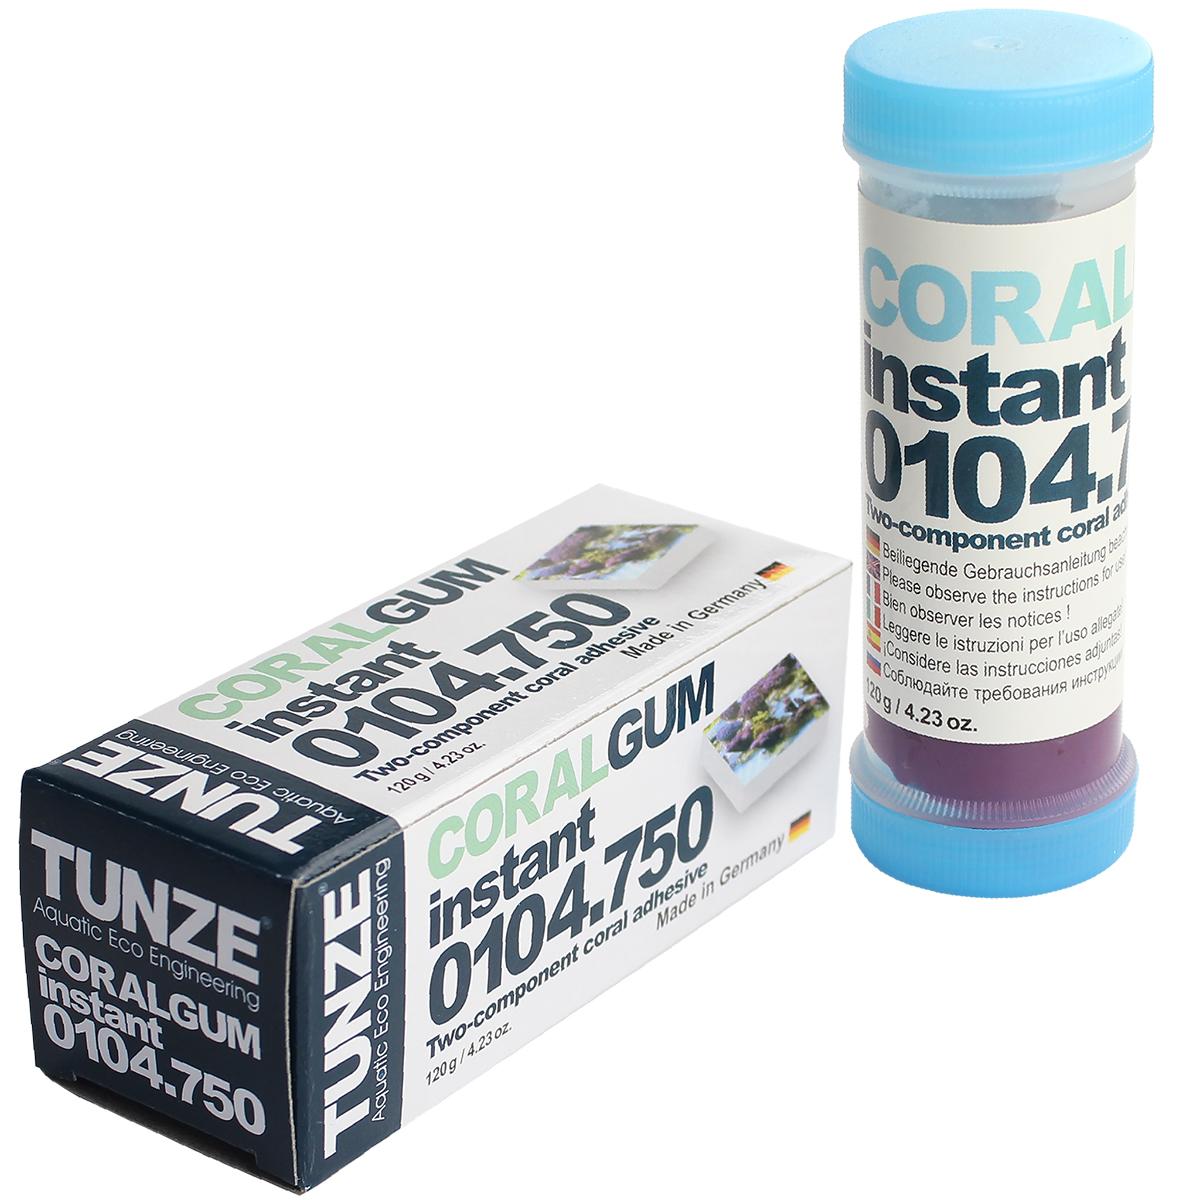 Coral Gum instant, 120 g